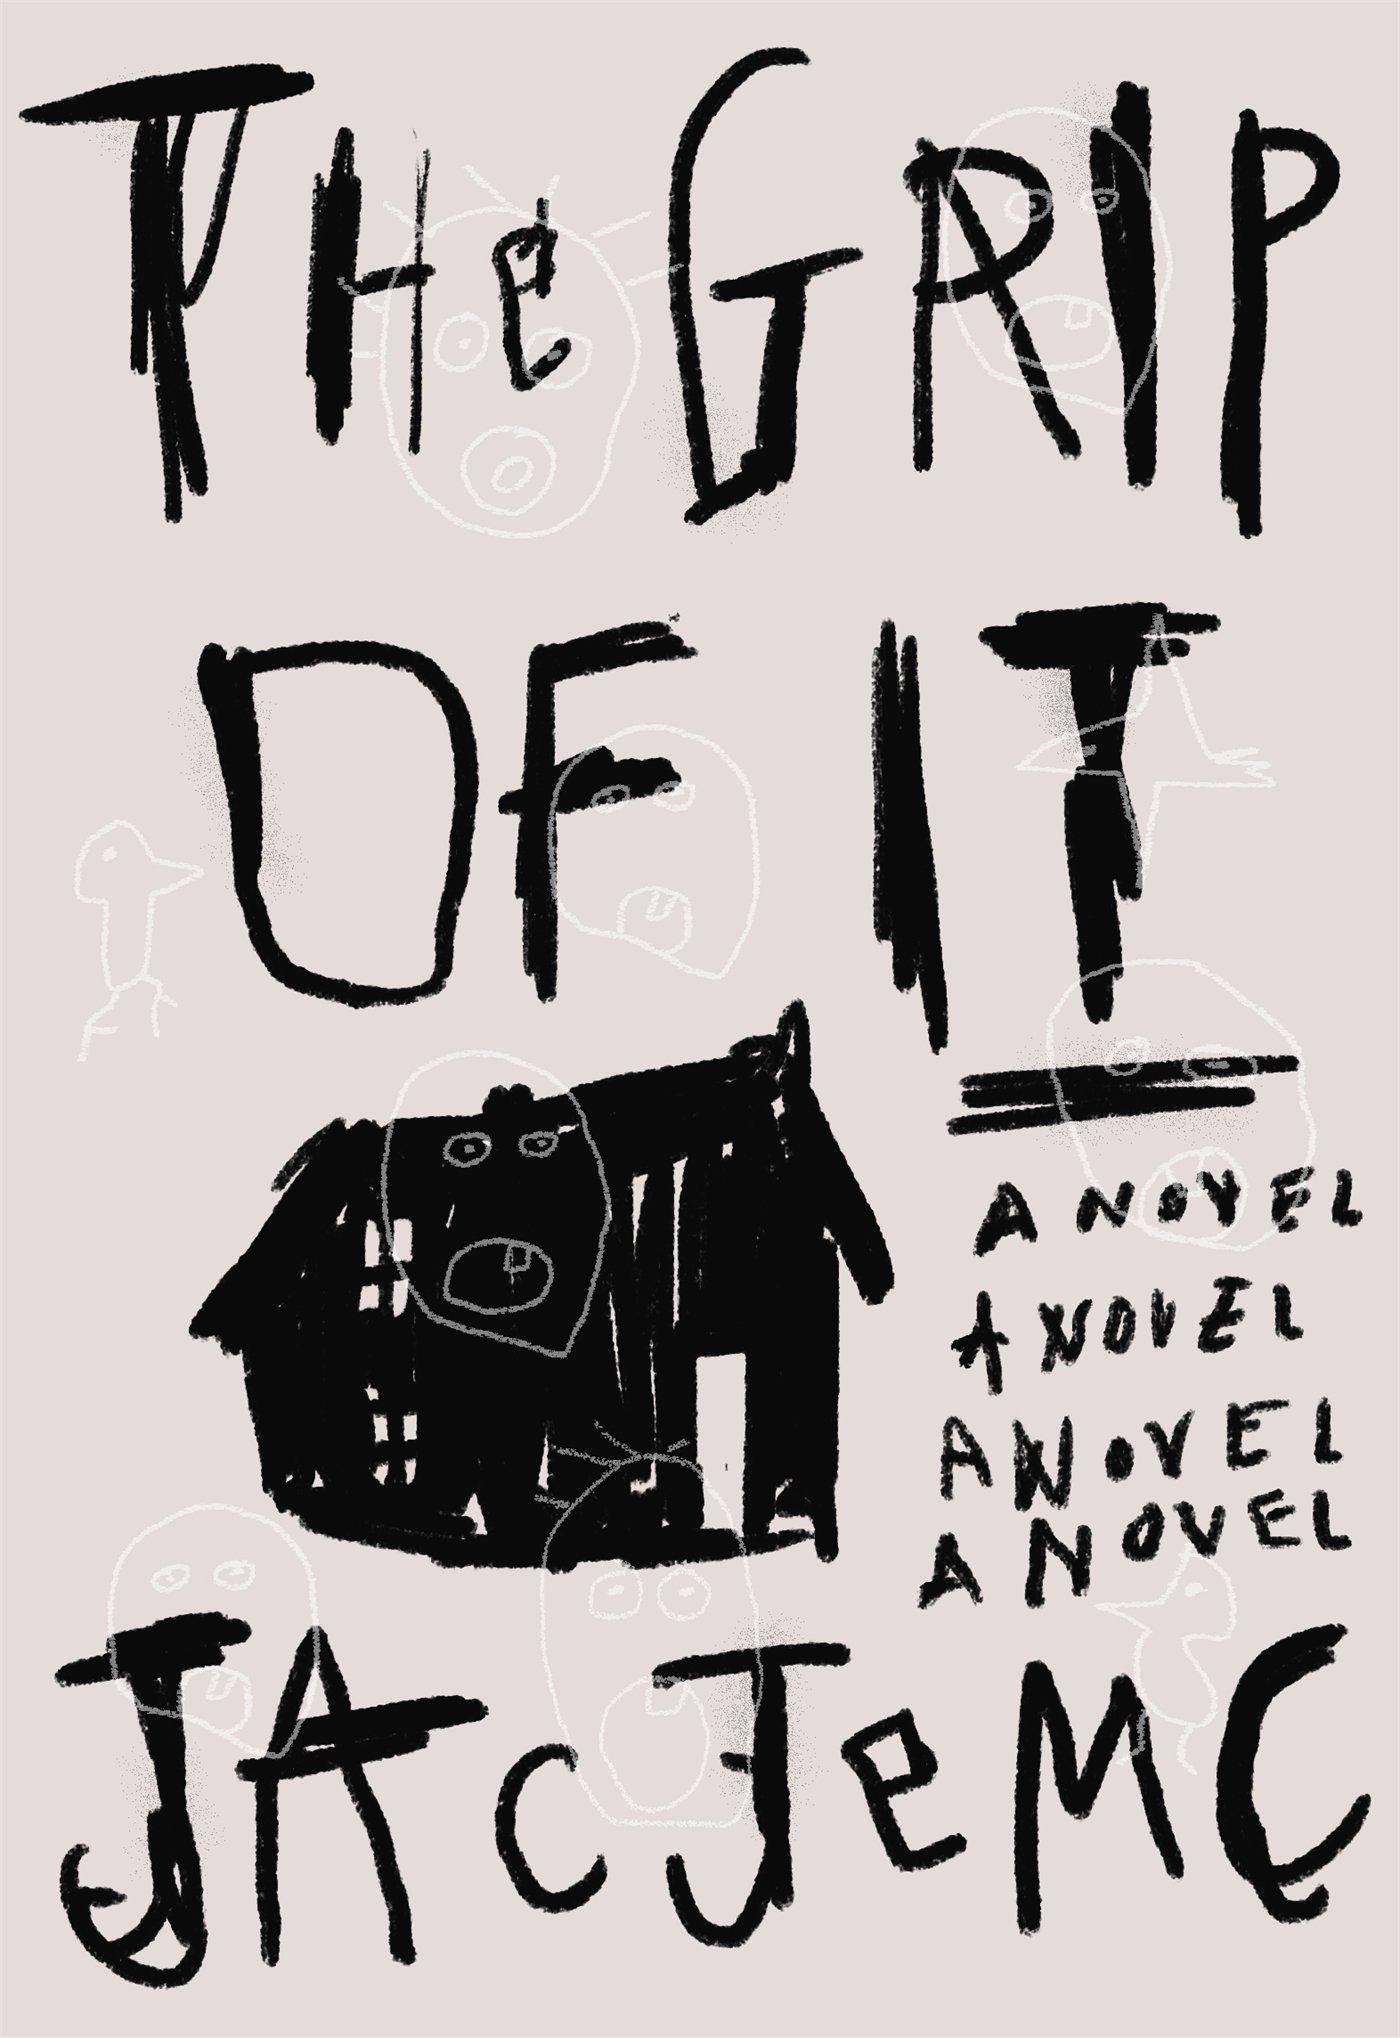 Amazon.com: The Grip of It: A Novel: 9780374536916: Jemc, Jac: Books